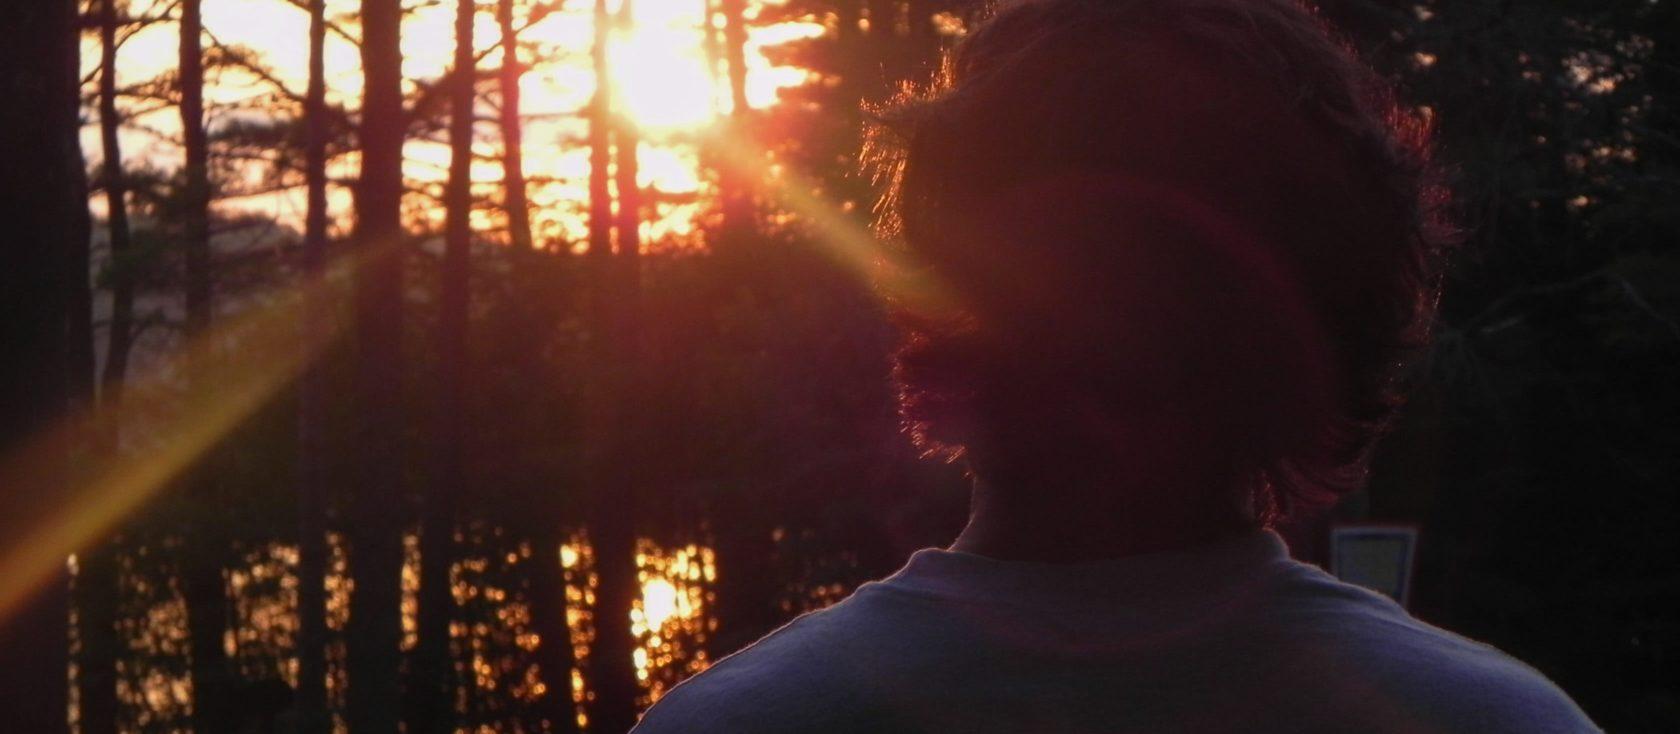 camper watching a sunset